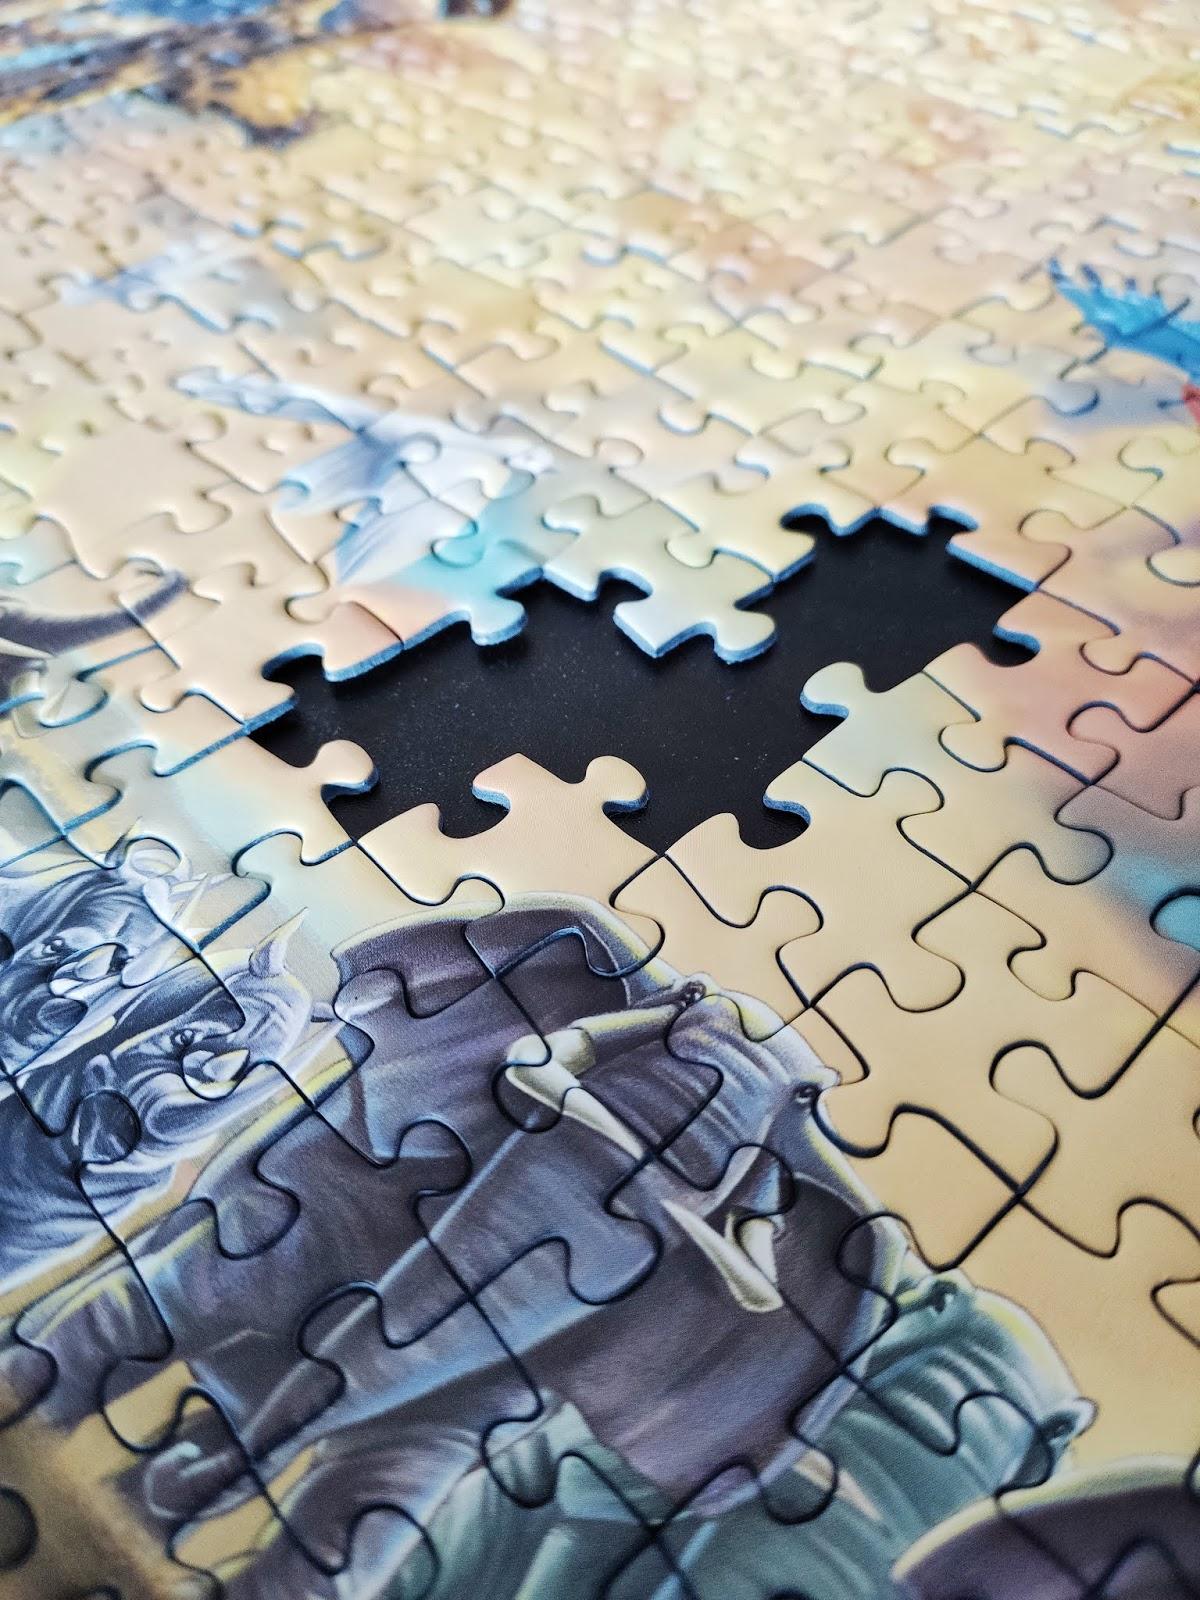 Kampf gegen Mental Load: Puzzle als regelmäßige Ablenkung